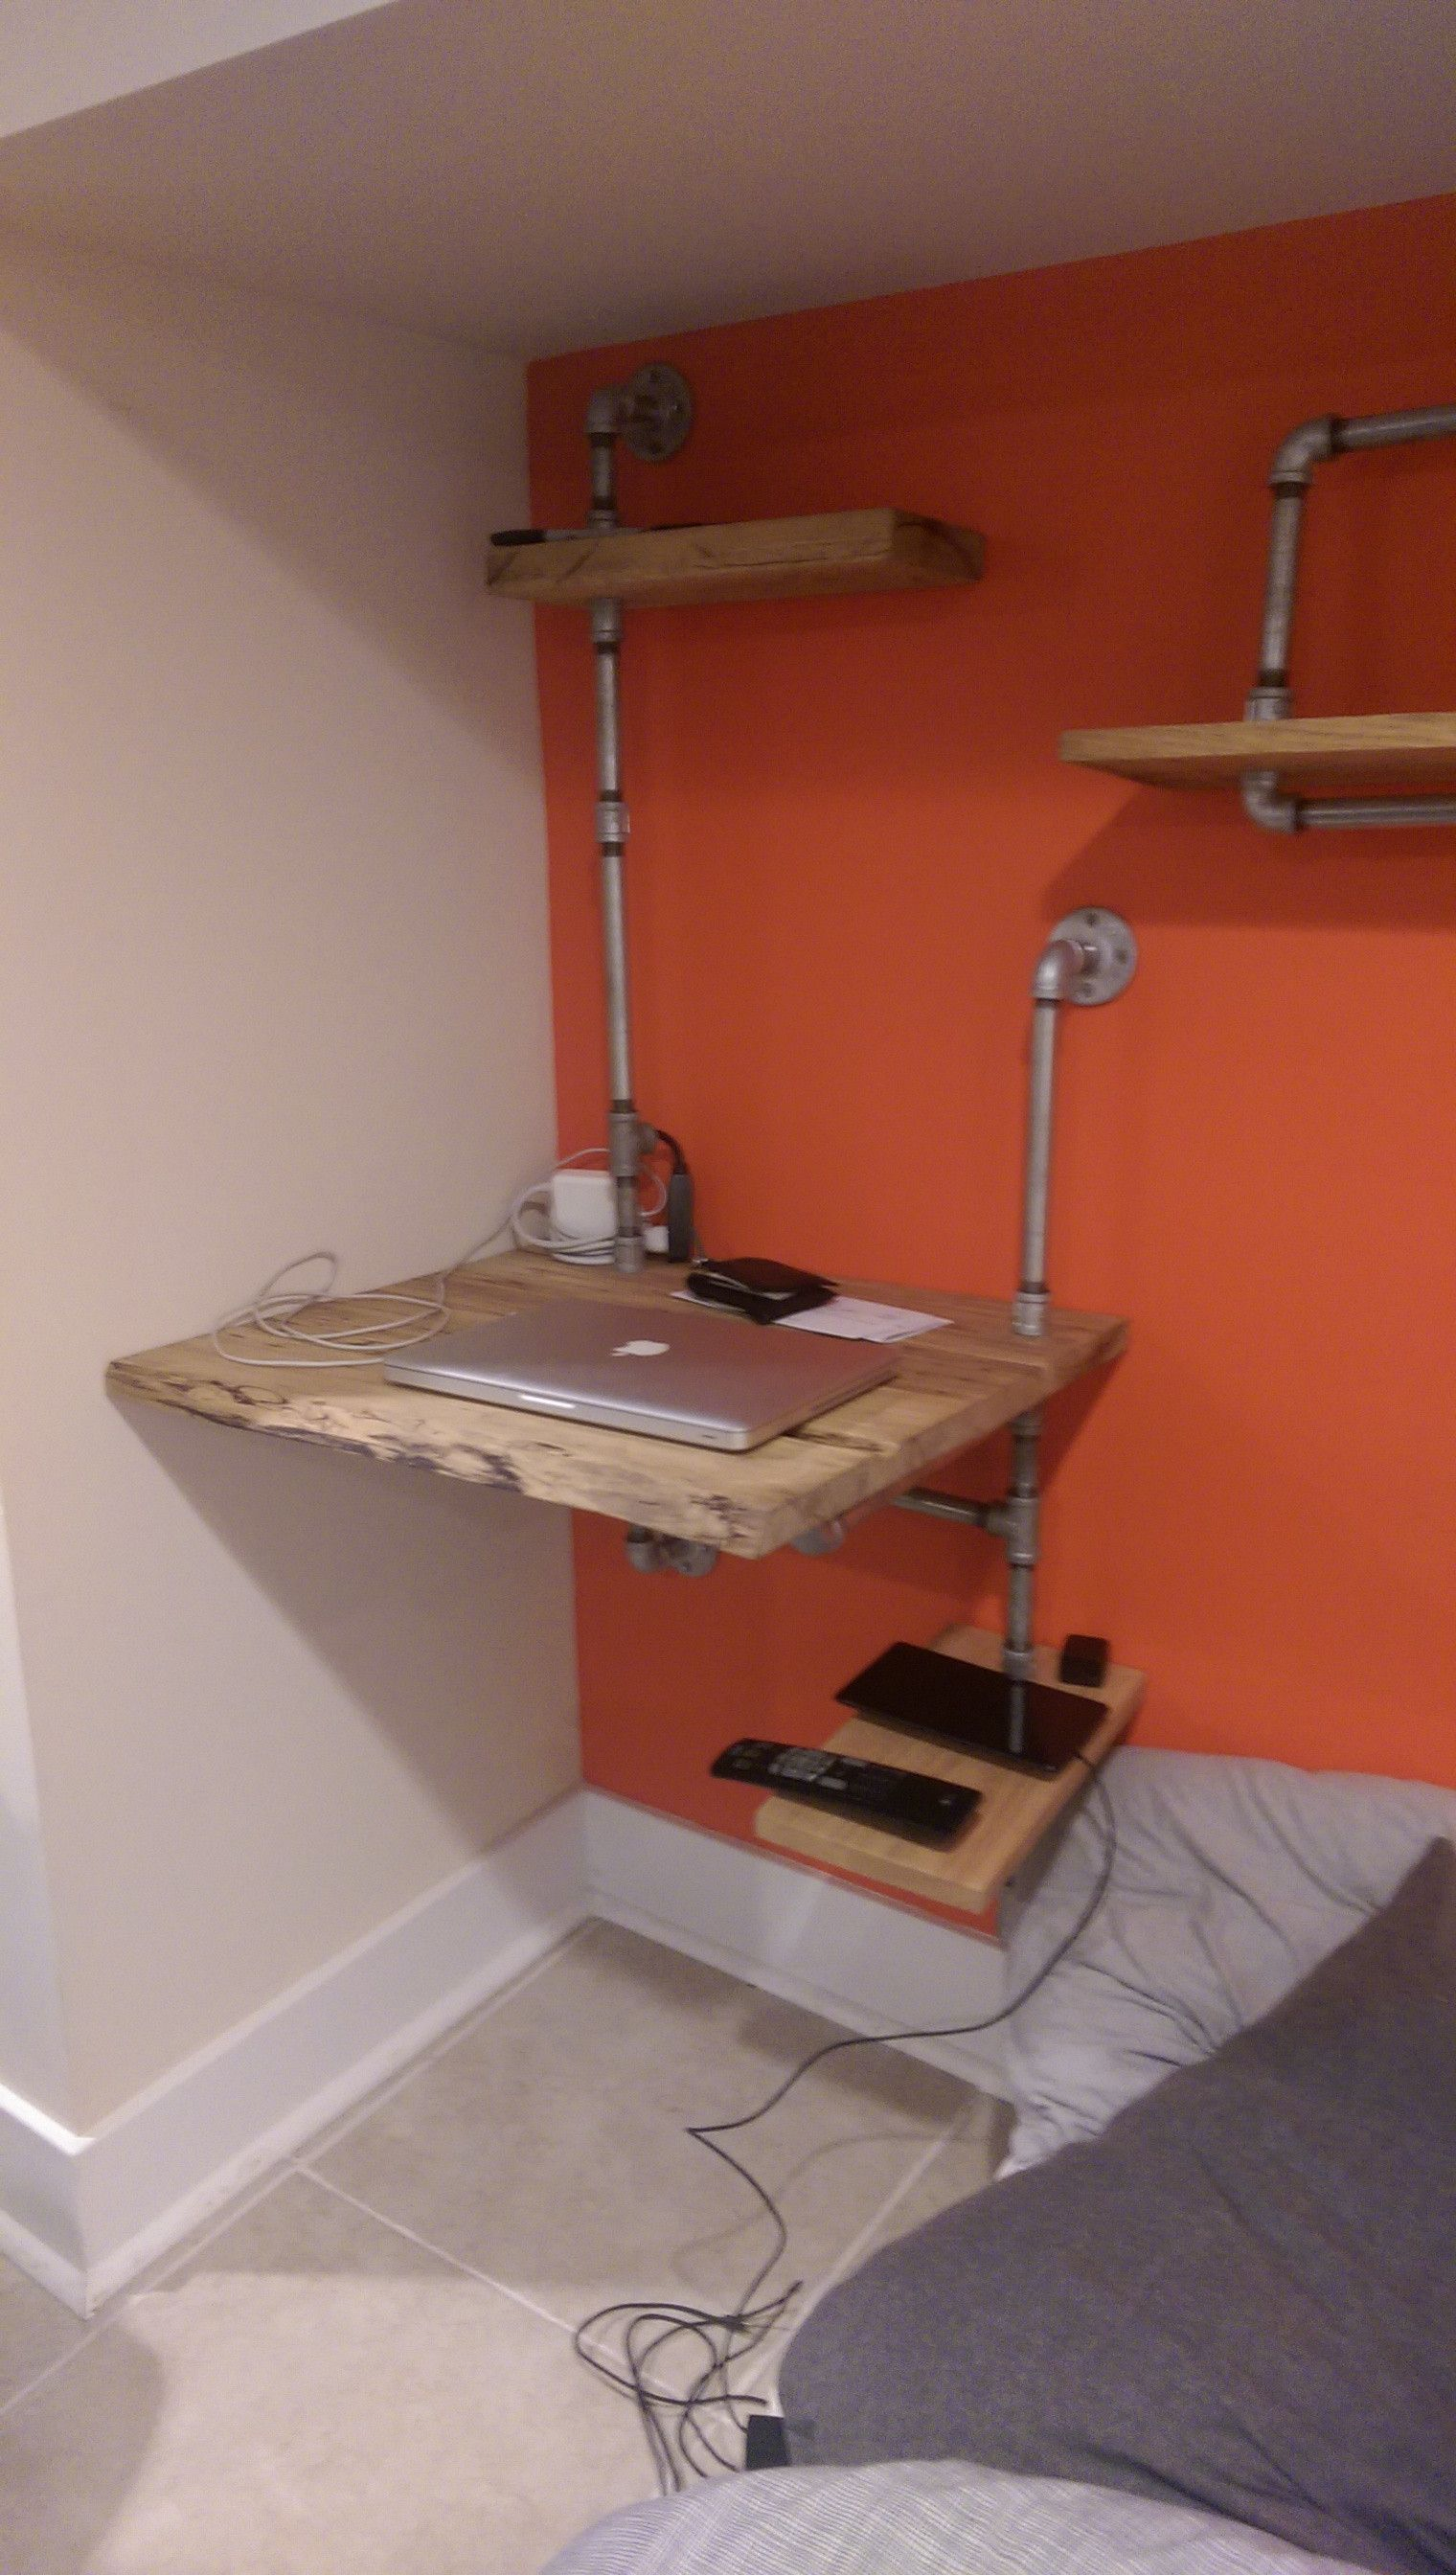 Hanging wall desk with plumbing